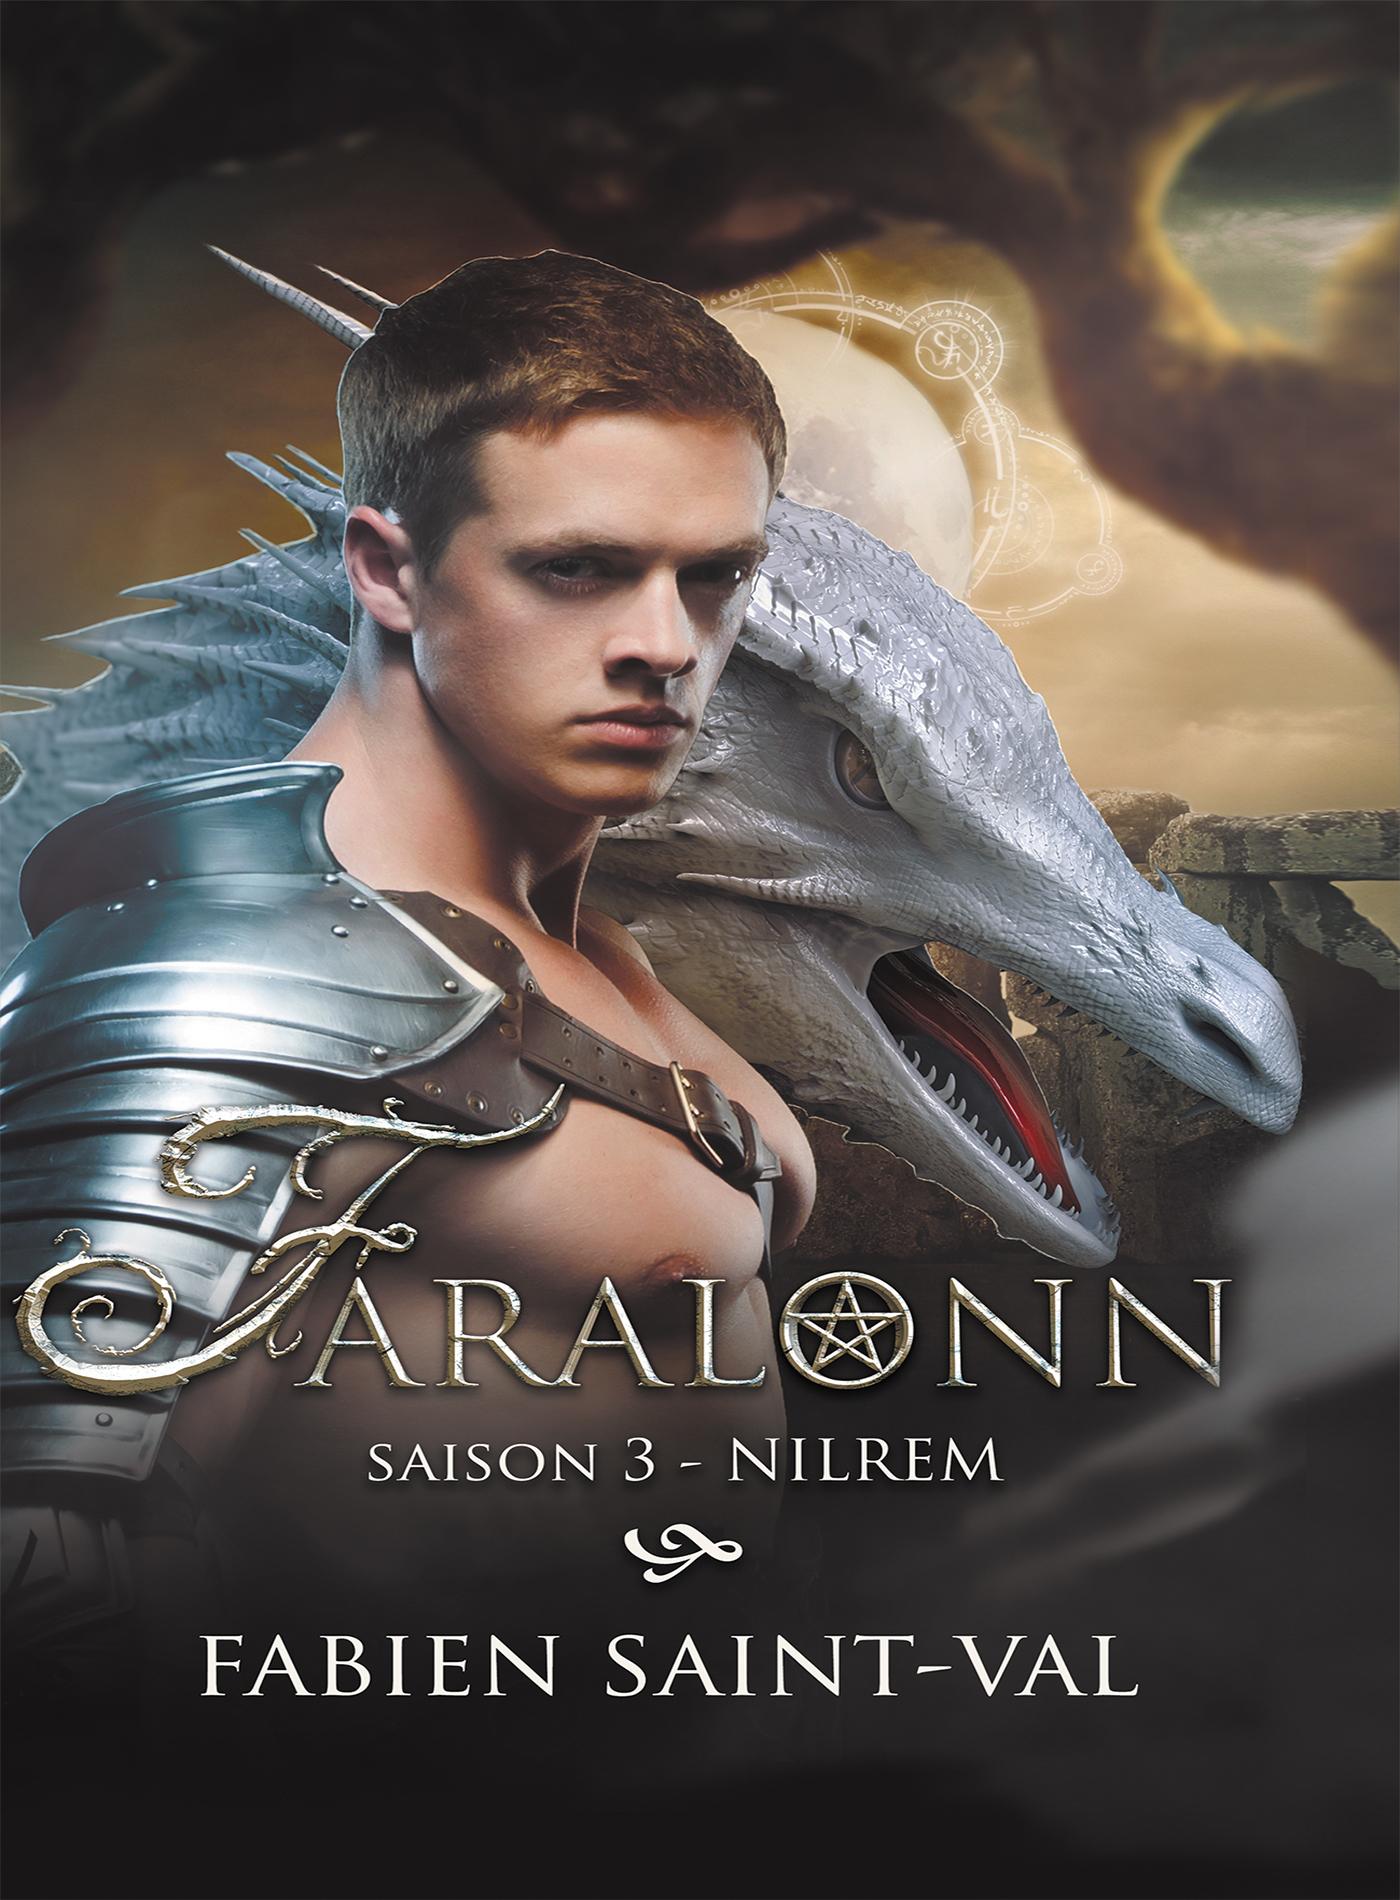 FARALONN SAISON 3 - NILREM